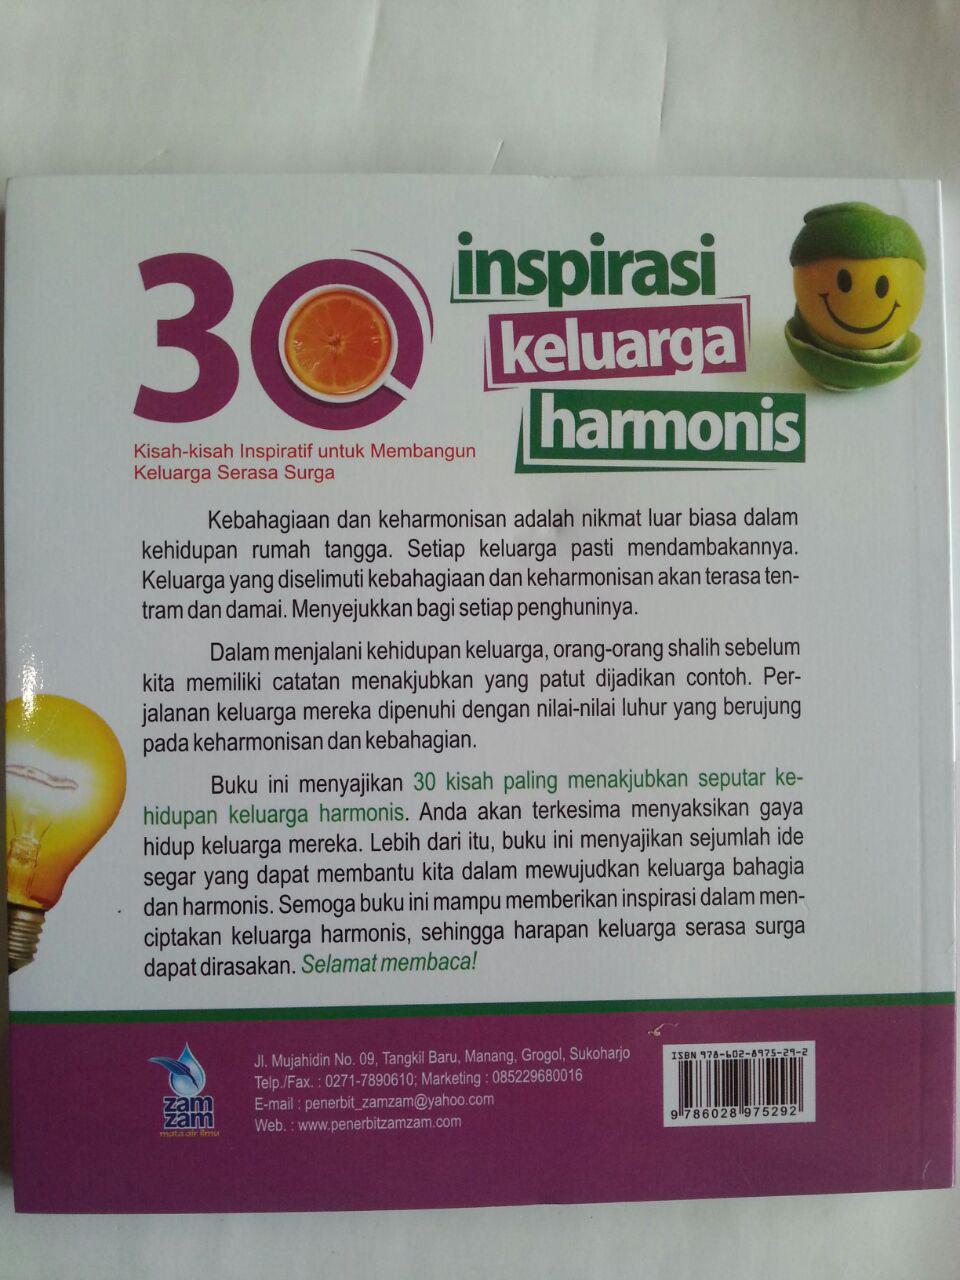 Buku 30 Inspirasi Keluarga Harmonis Kisah-Kisah Inspiratif cover